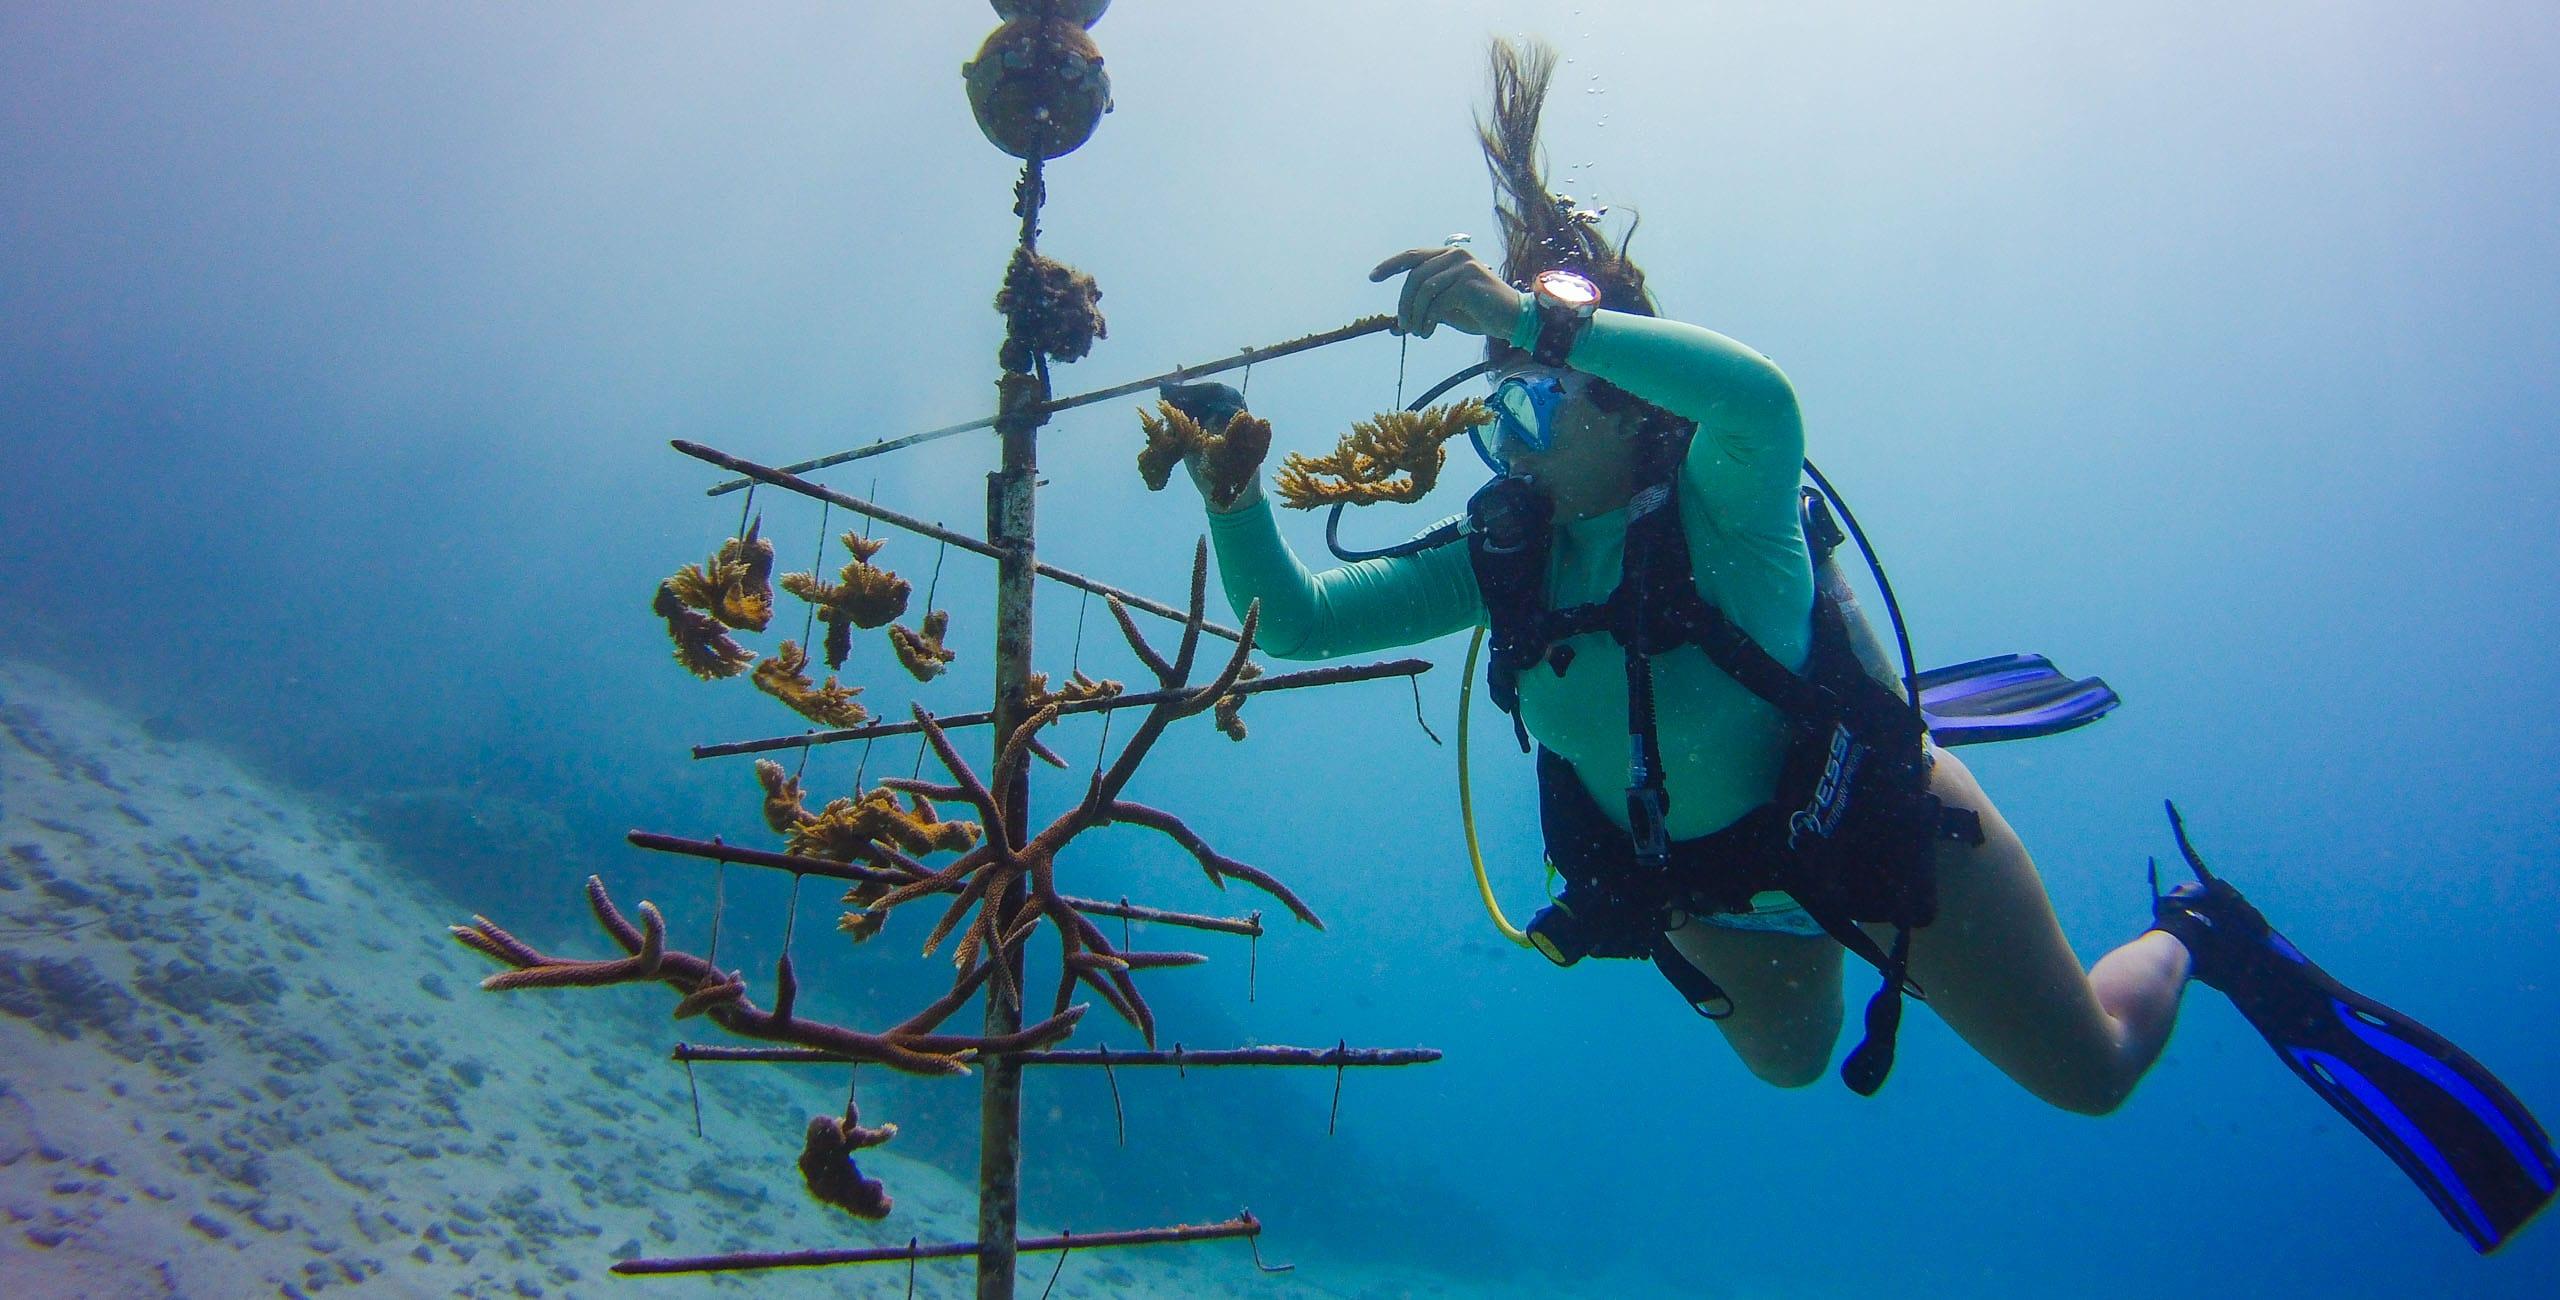 Female student scuba diving during field studies class